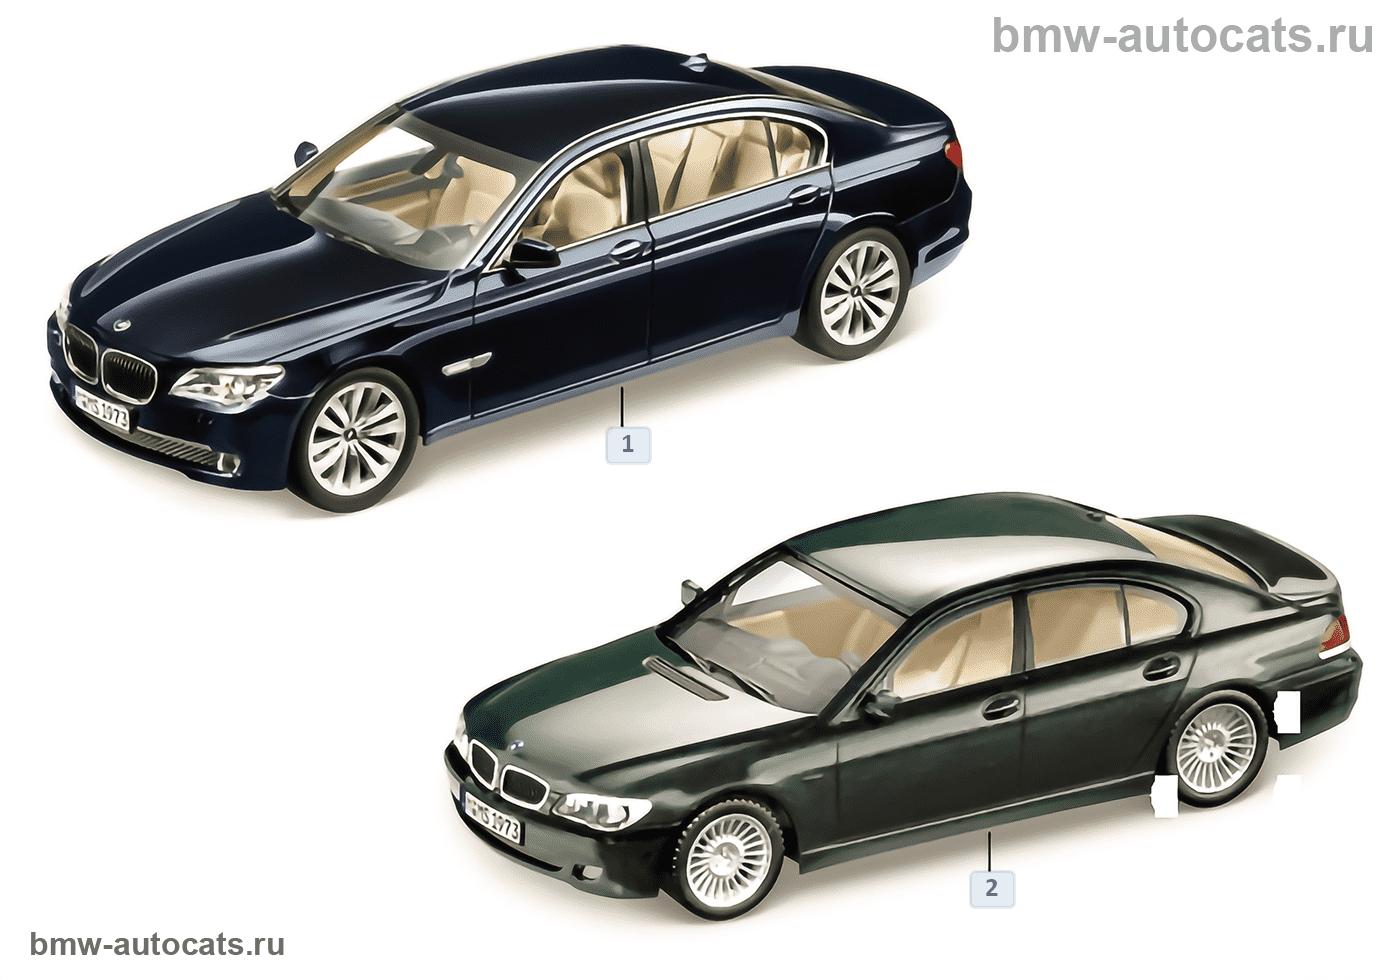 BMW Miniaturen — BMW 7er Reihe 2010/11